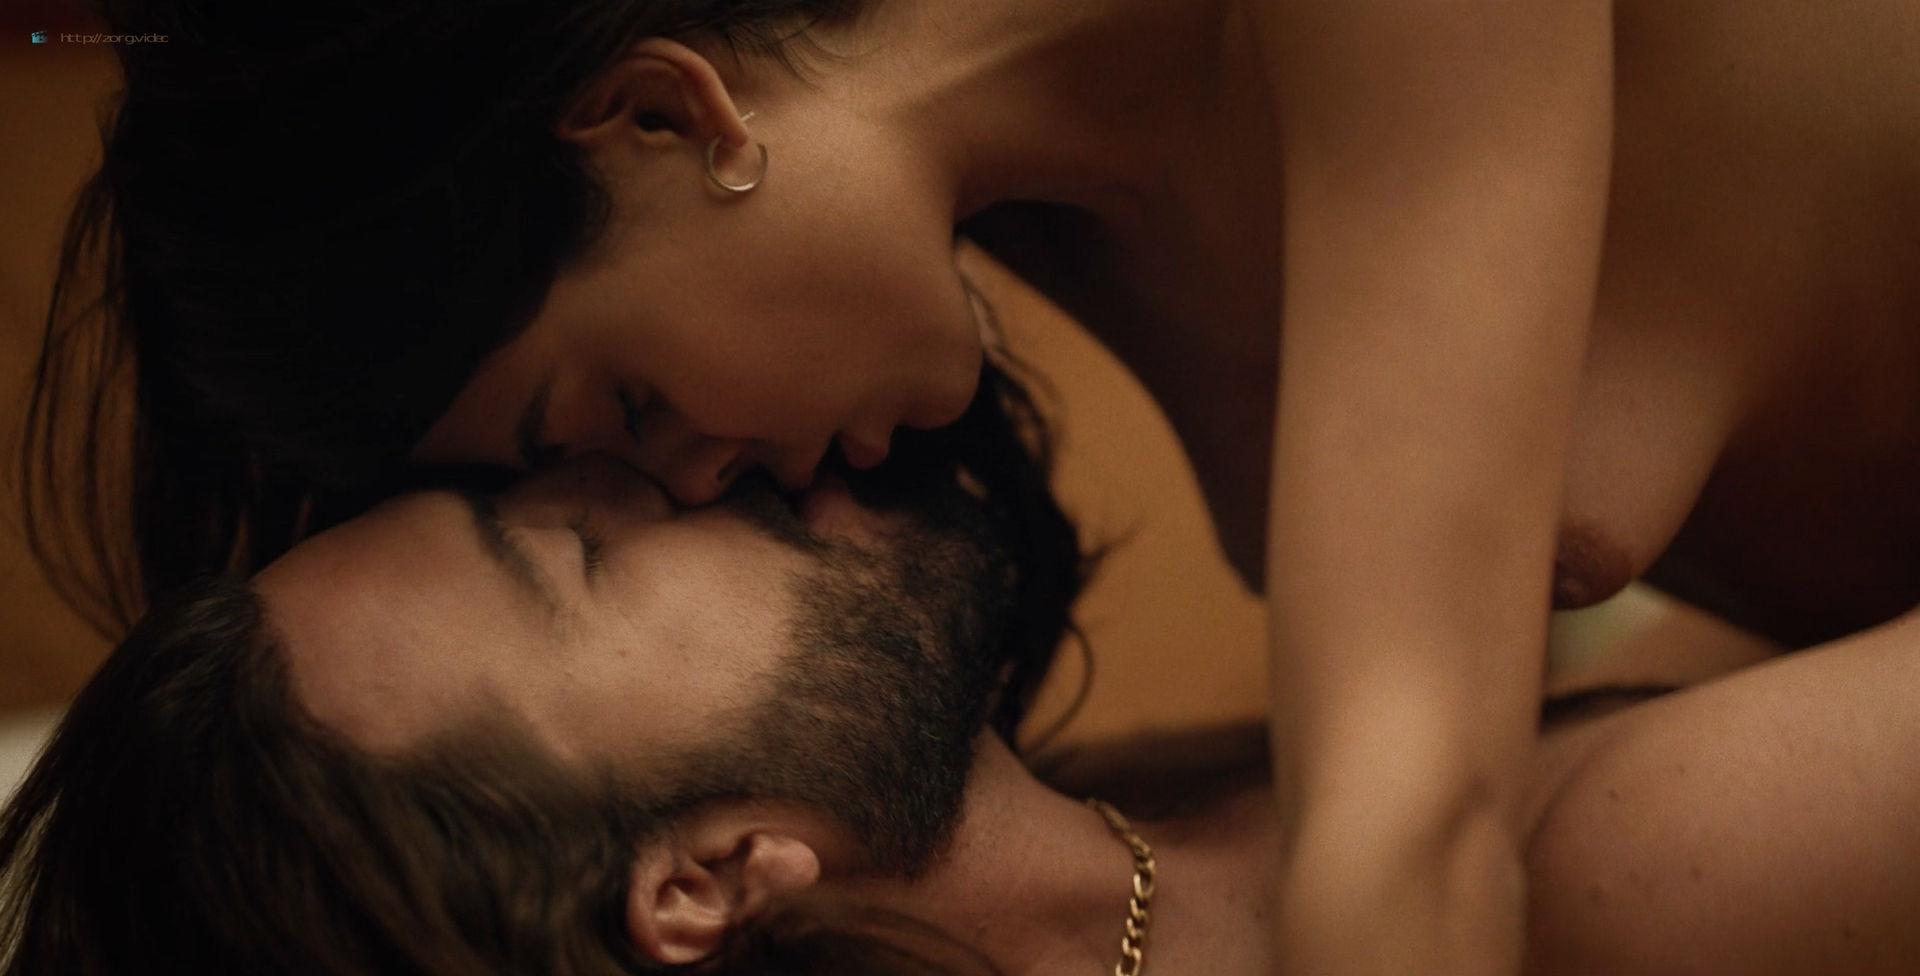 Ana Layevska nude lesbian sex with Florencia Ríos - Yankee (2019) S1 HD 1080p (6)